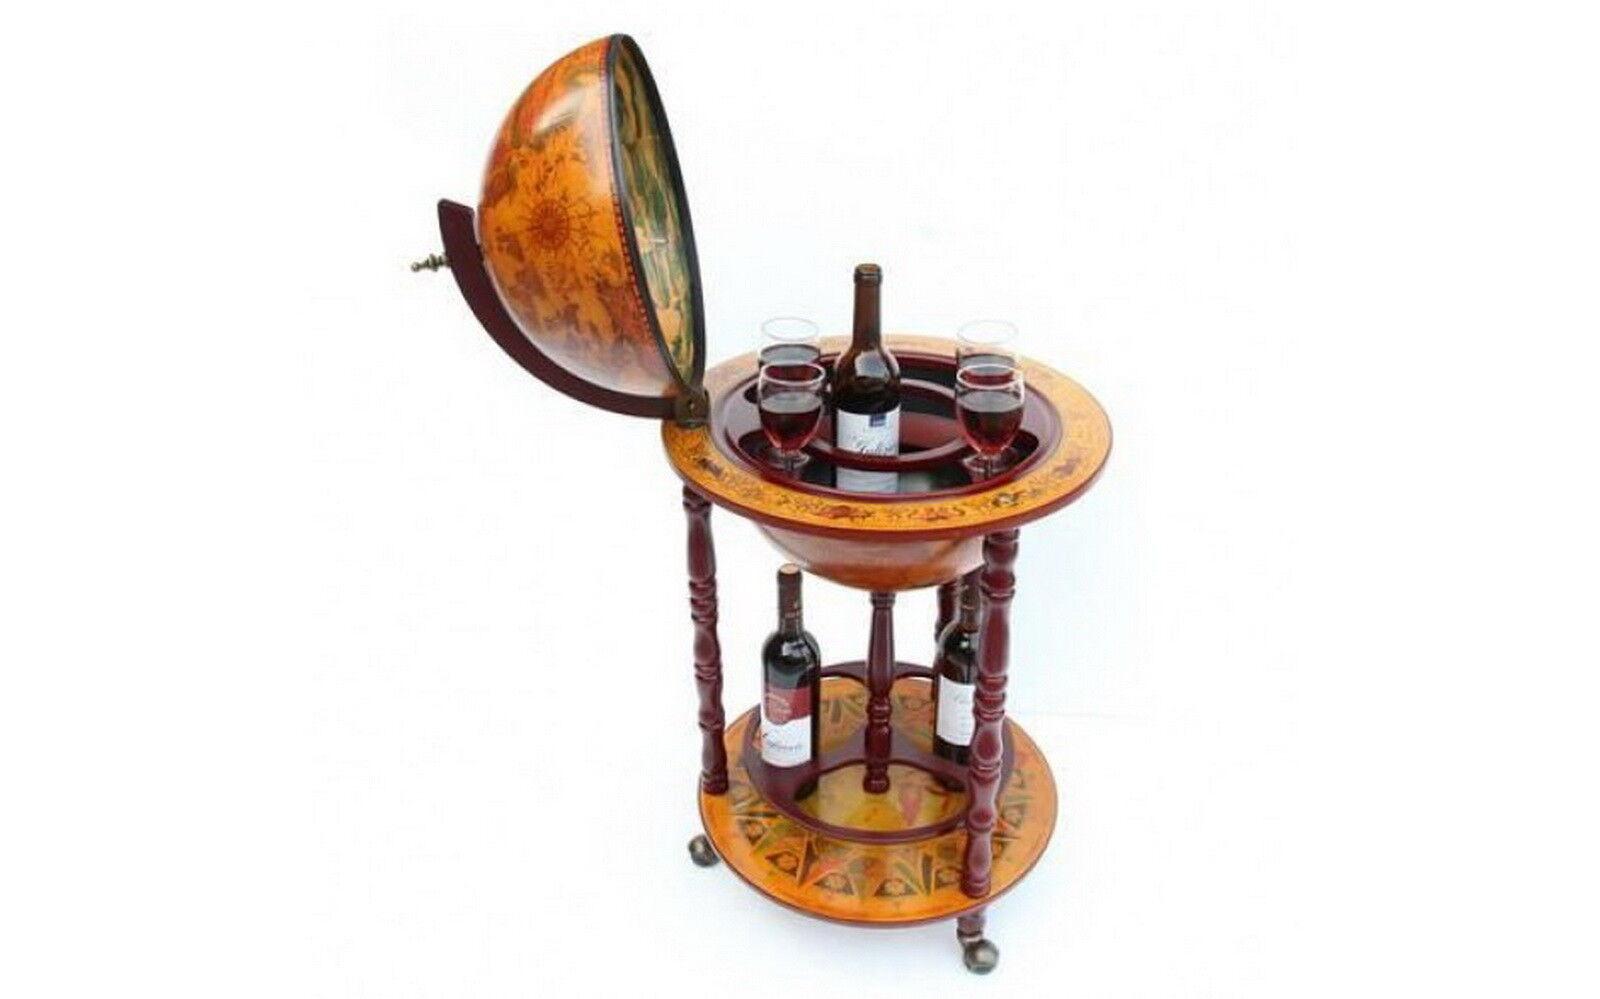 Mini Bar Wine Container Minibar Wooden Globe Drink Bottle Glasses Wheel Portable